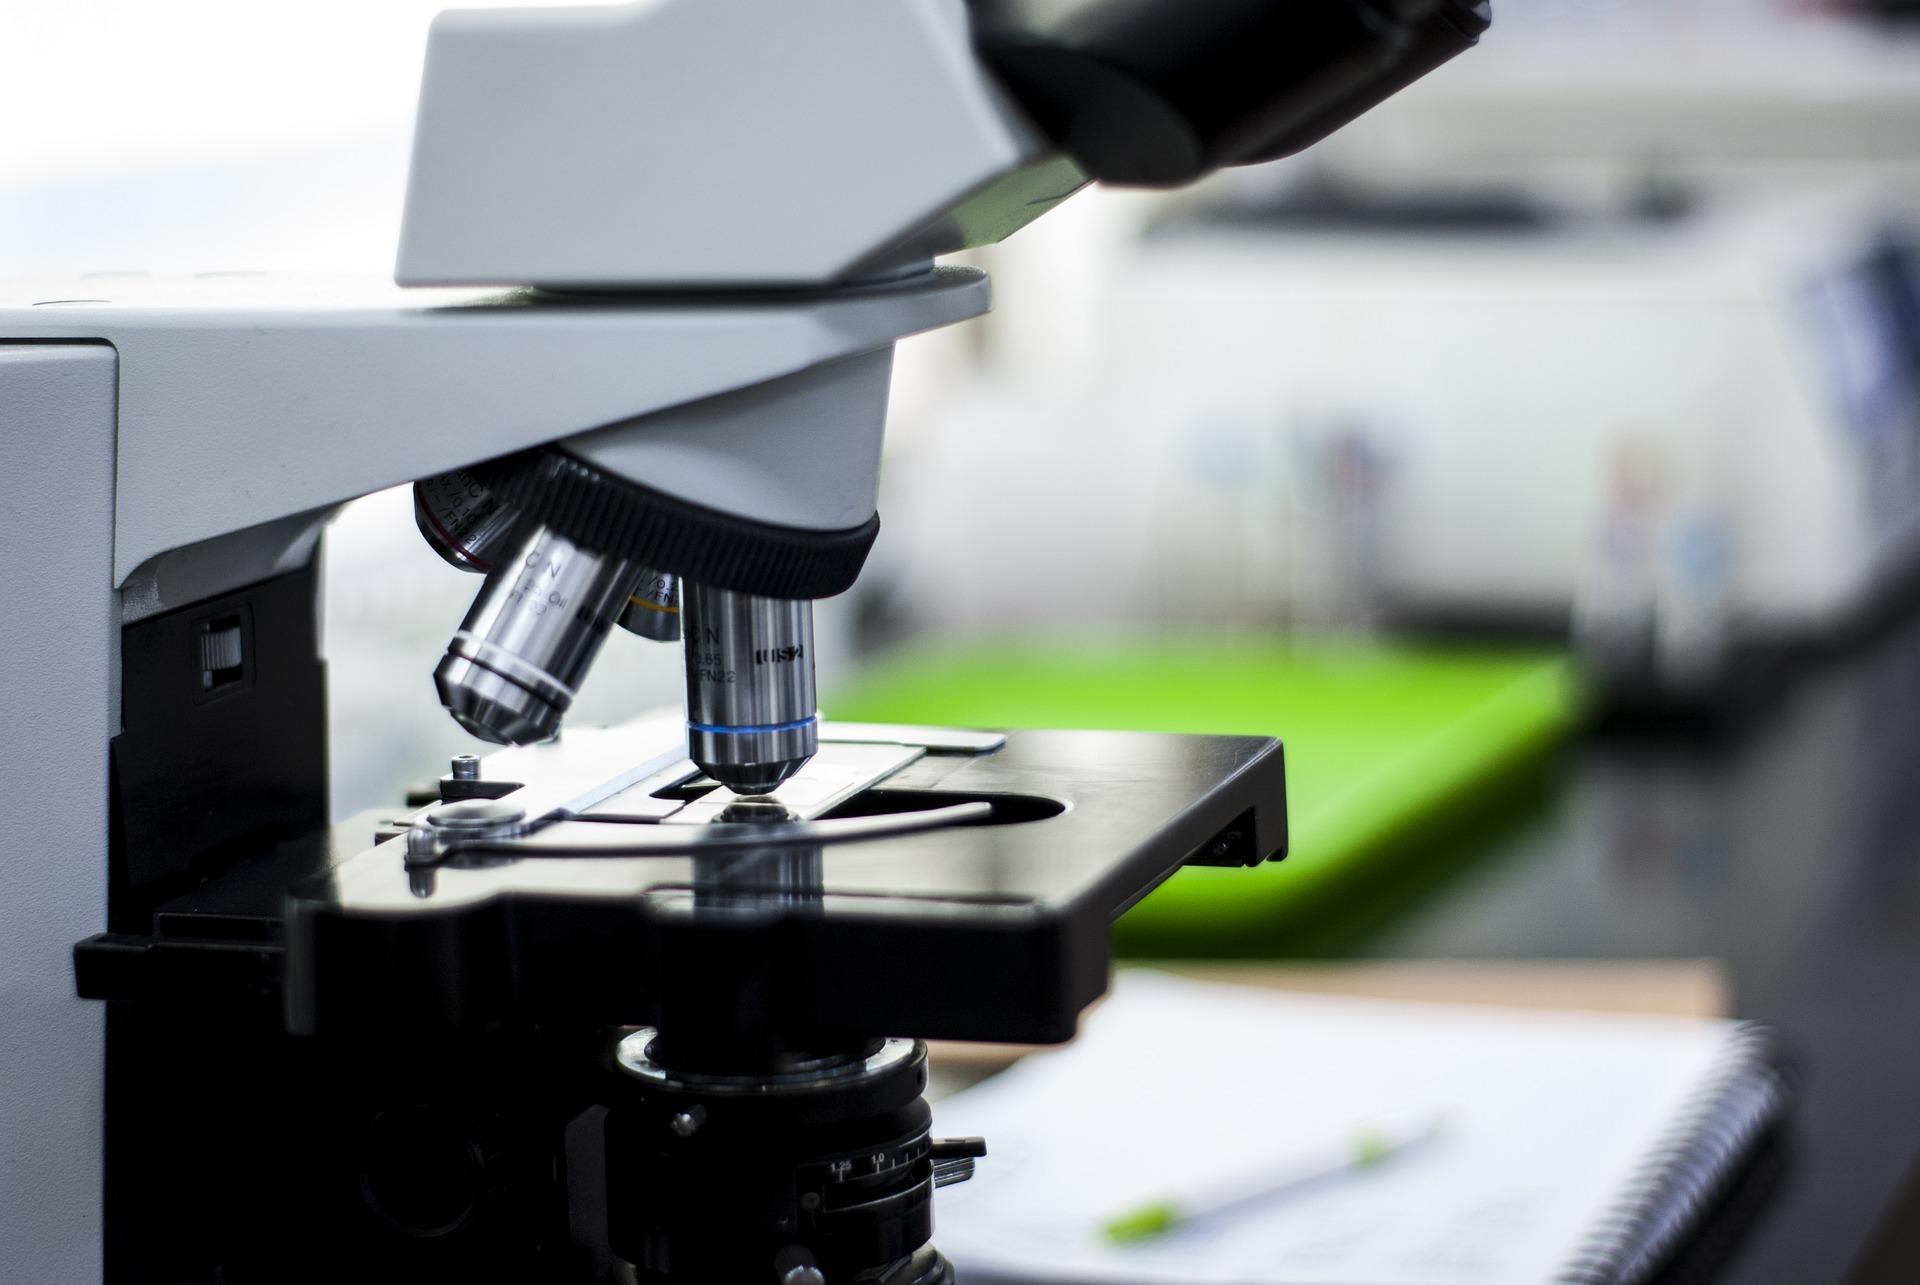 microscope setup for a user